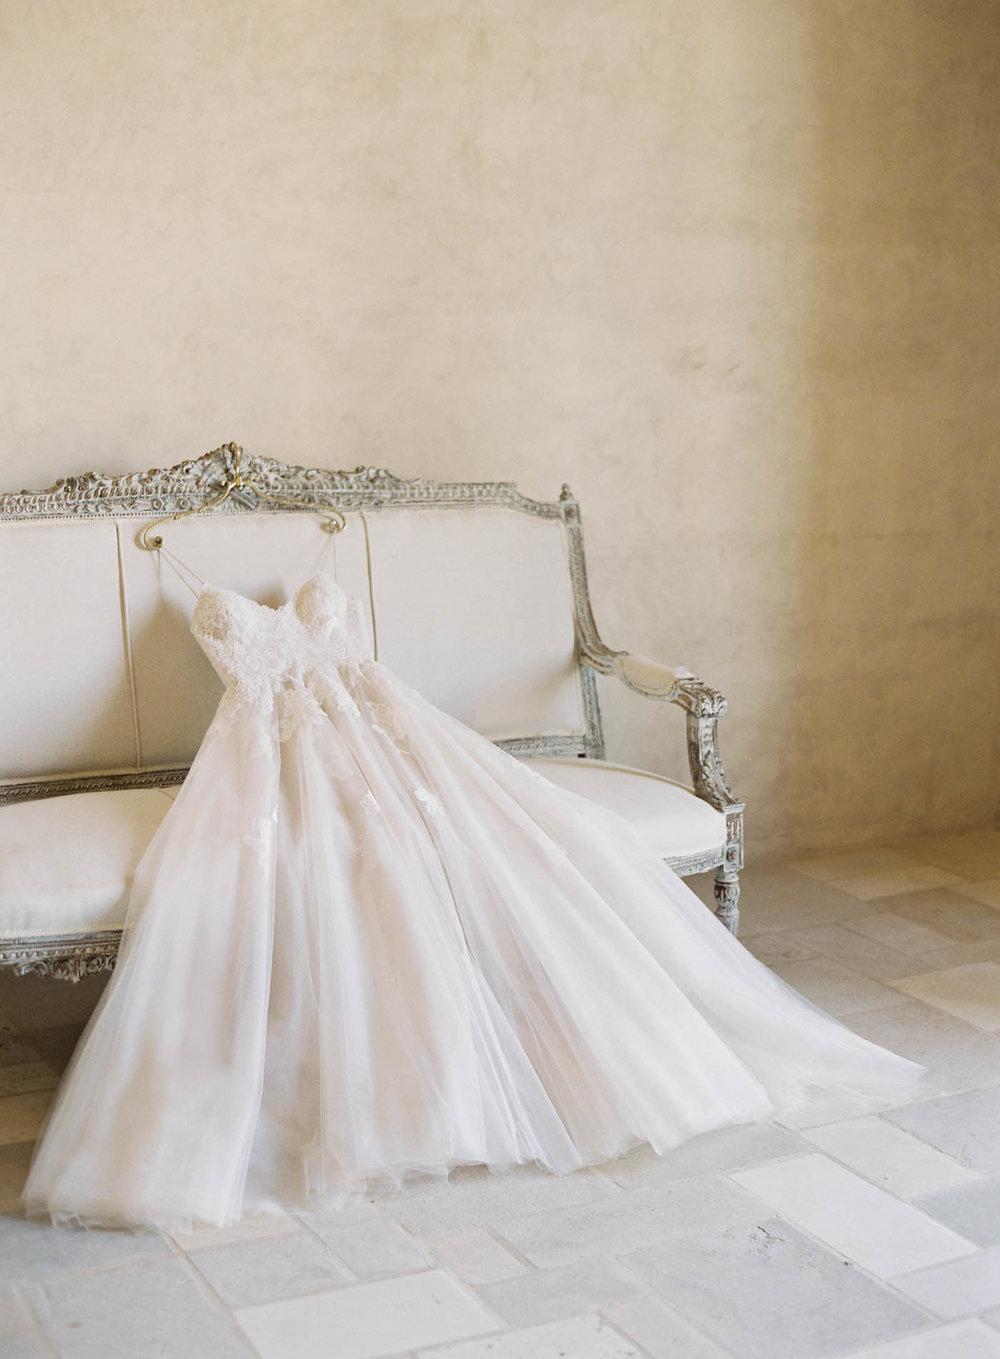 sunstone-villa-wedding-1-Jen_Huang-RD-1-Jen_Huang-009579-R1-003.jpg